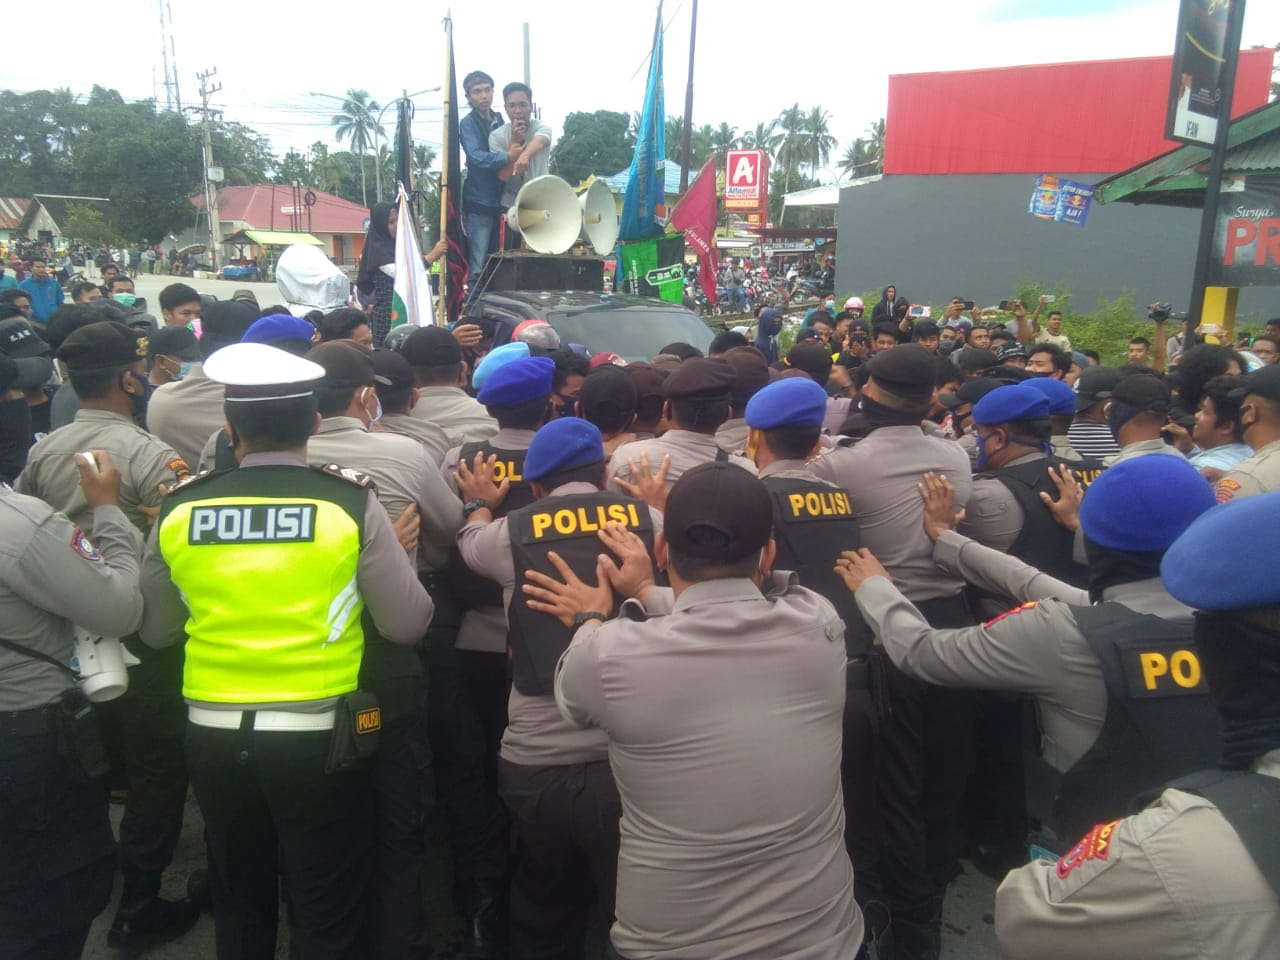 Ketgam : Polisi saat mengahalau massa aksi yang hendak masuk bandara Udara haluole